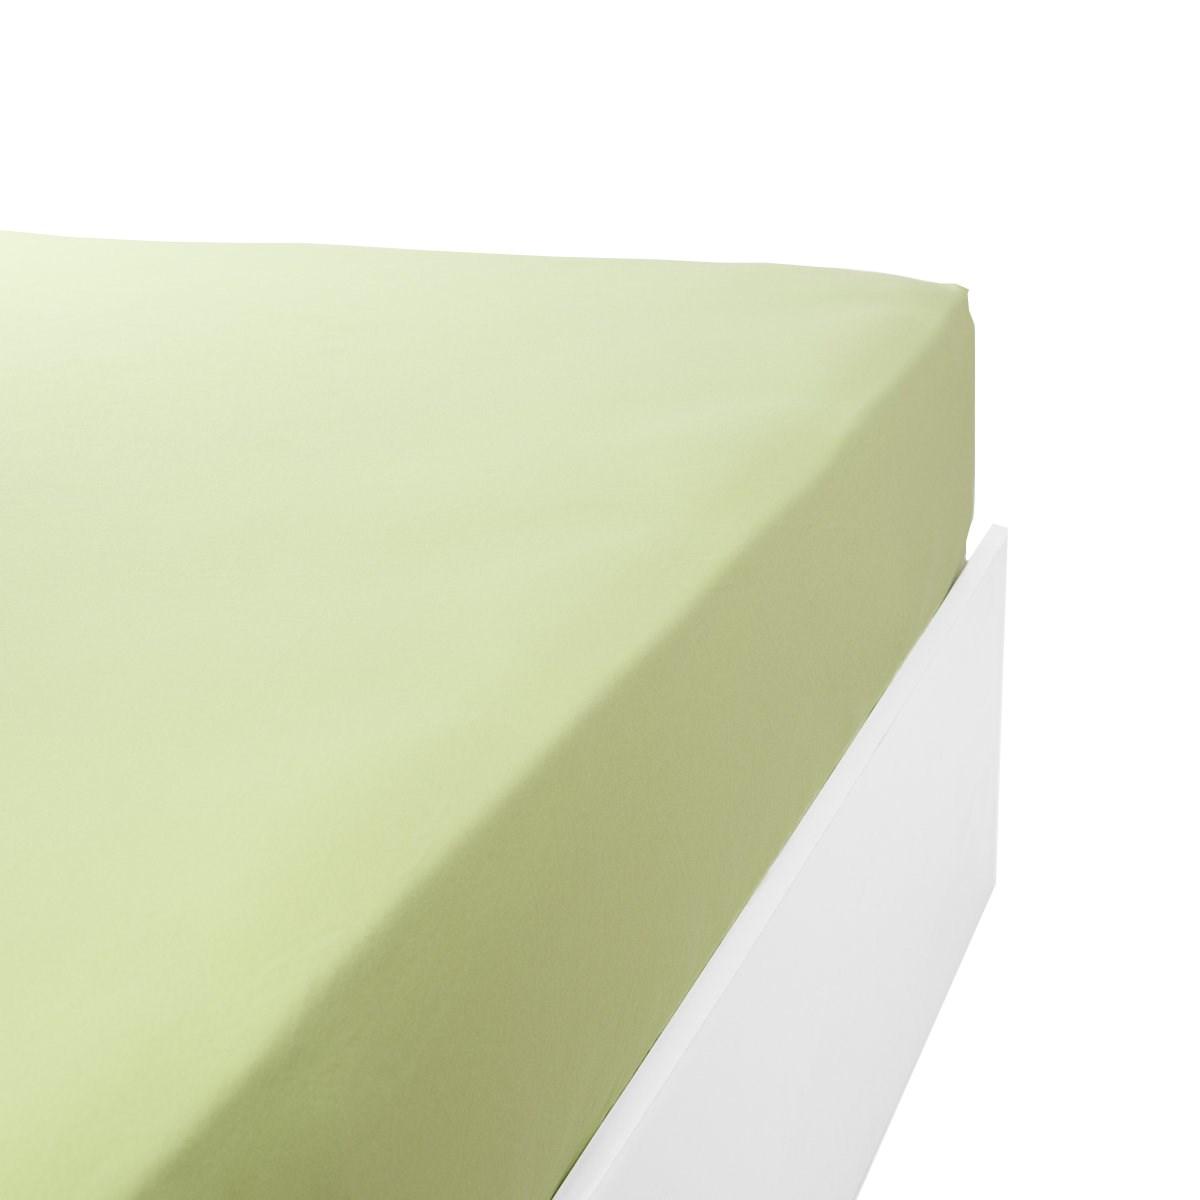 Drap housse flanelle en Molleton Vert anis 80x200 cm